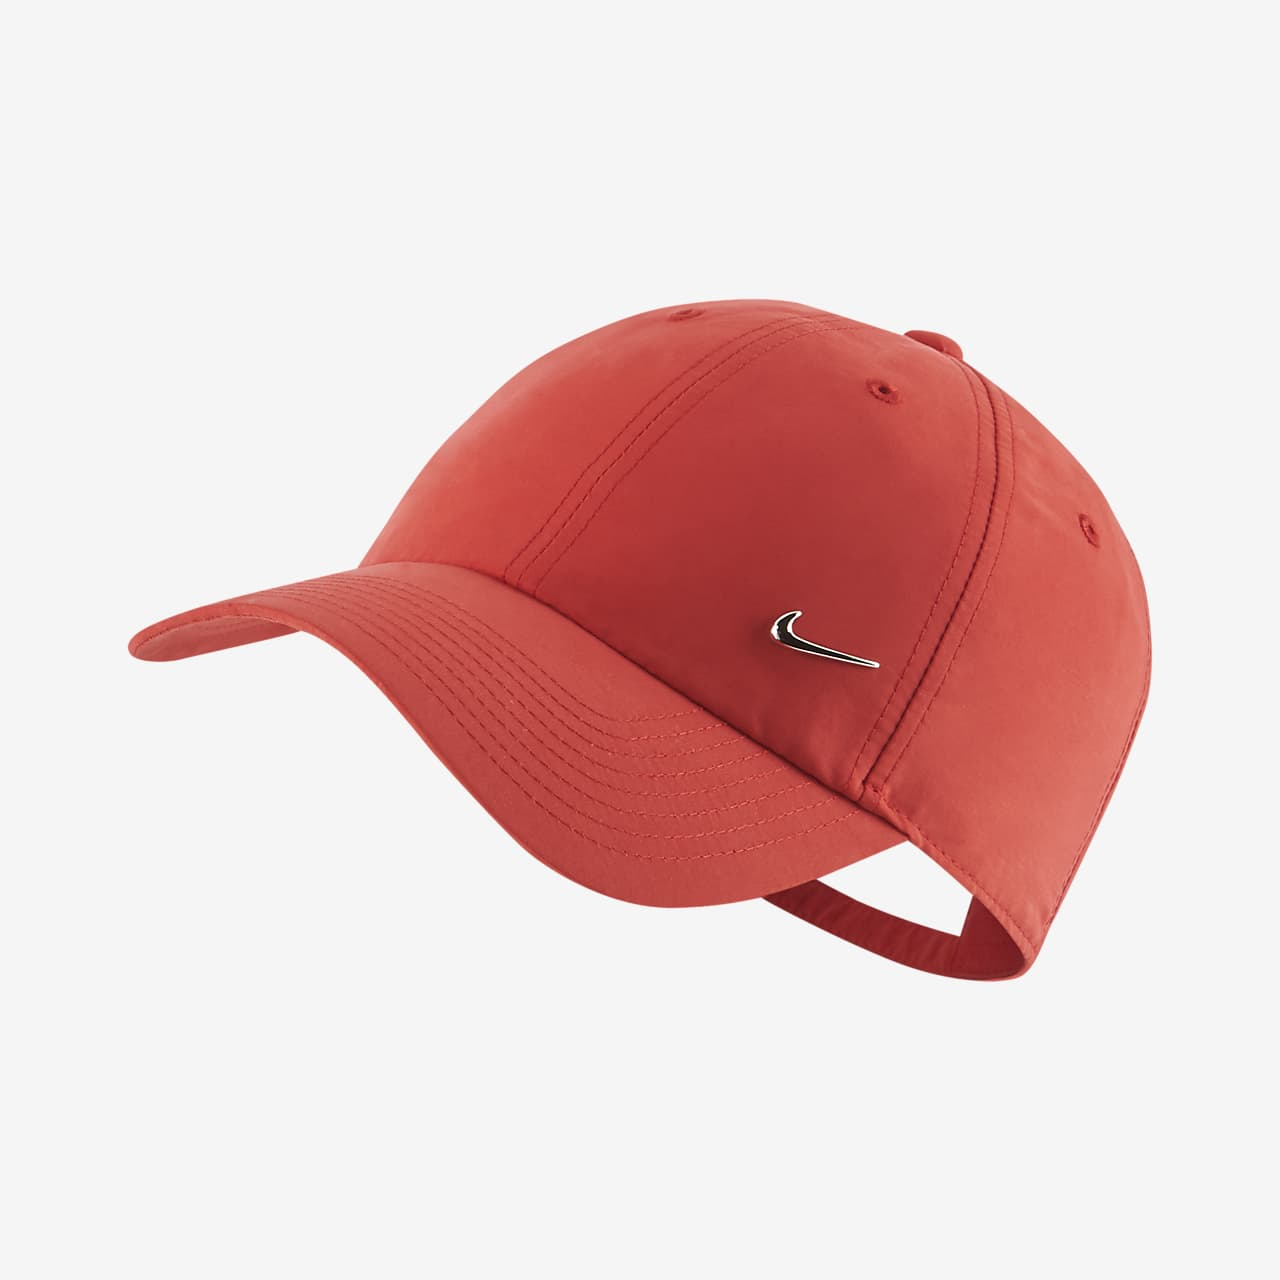 Nike Sportswear Heritage86 可調式帽款